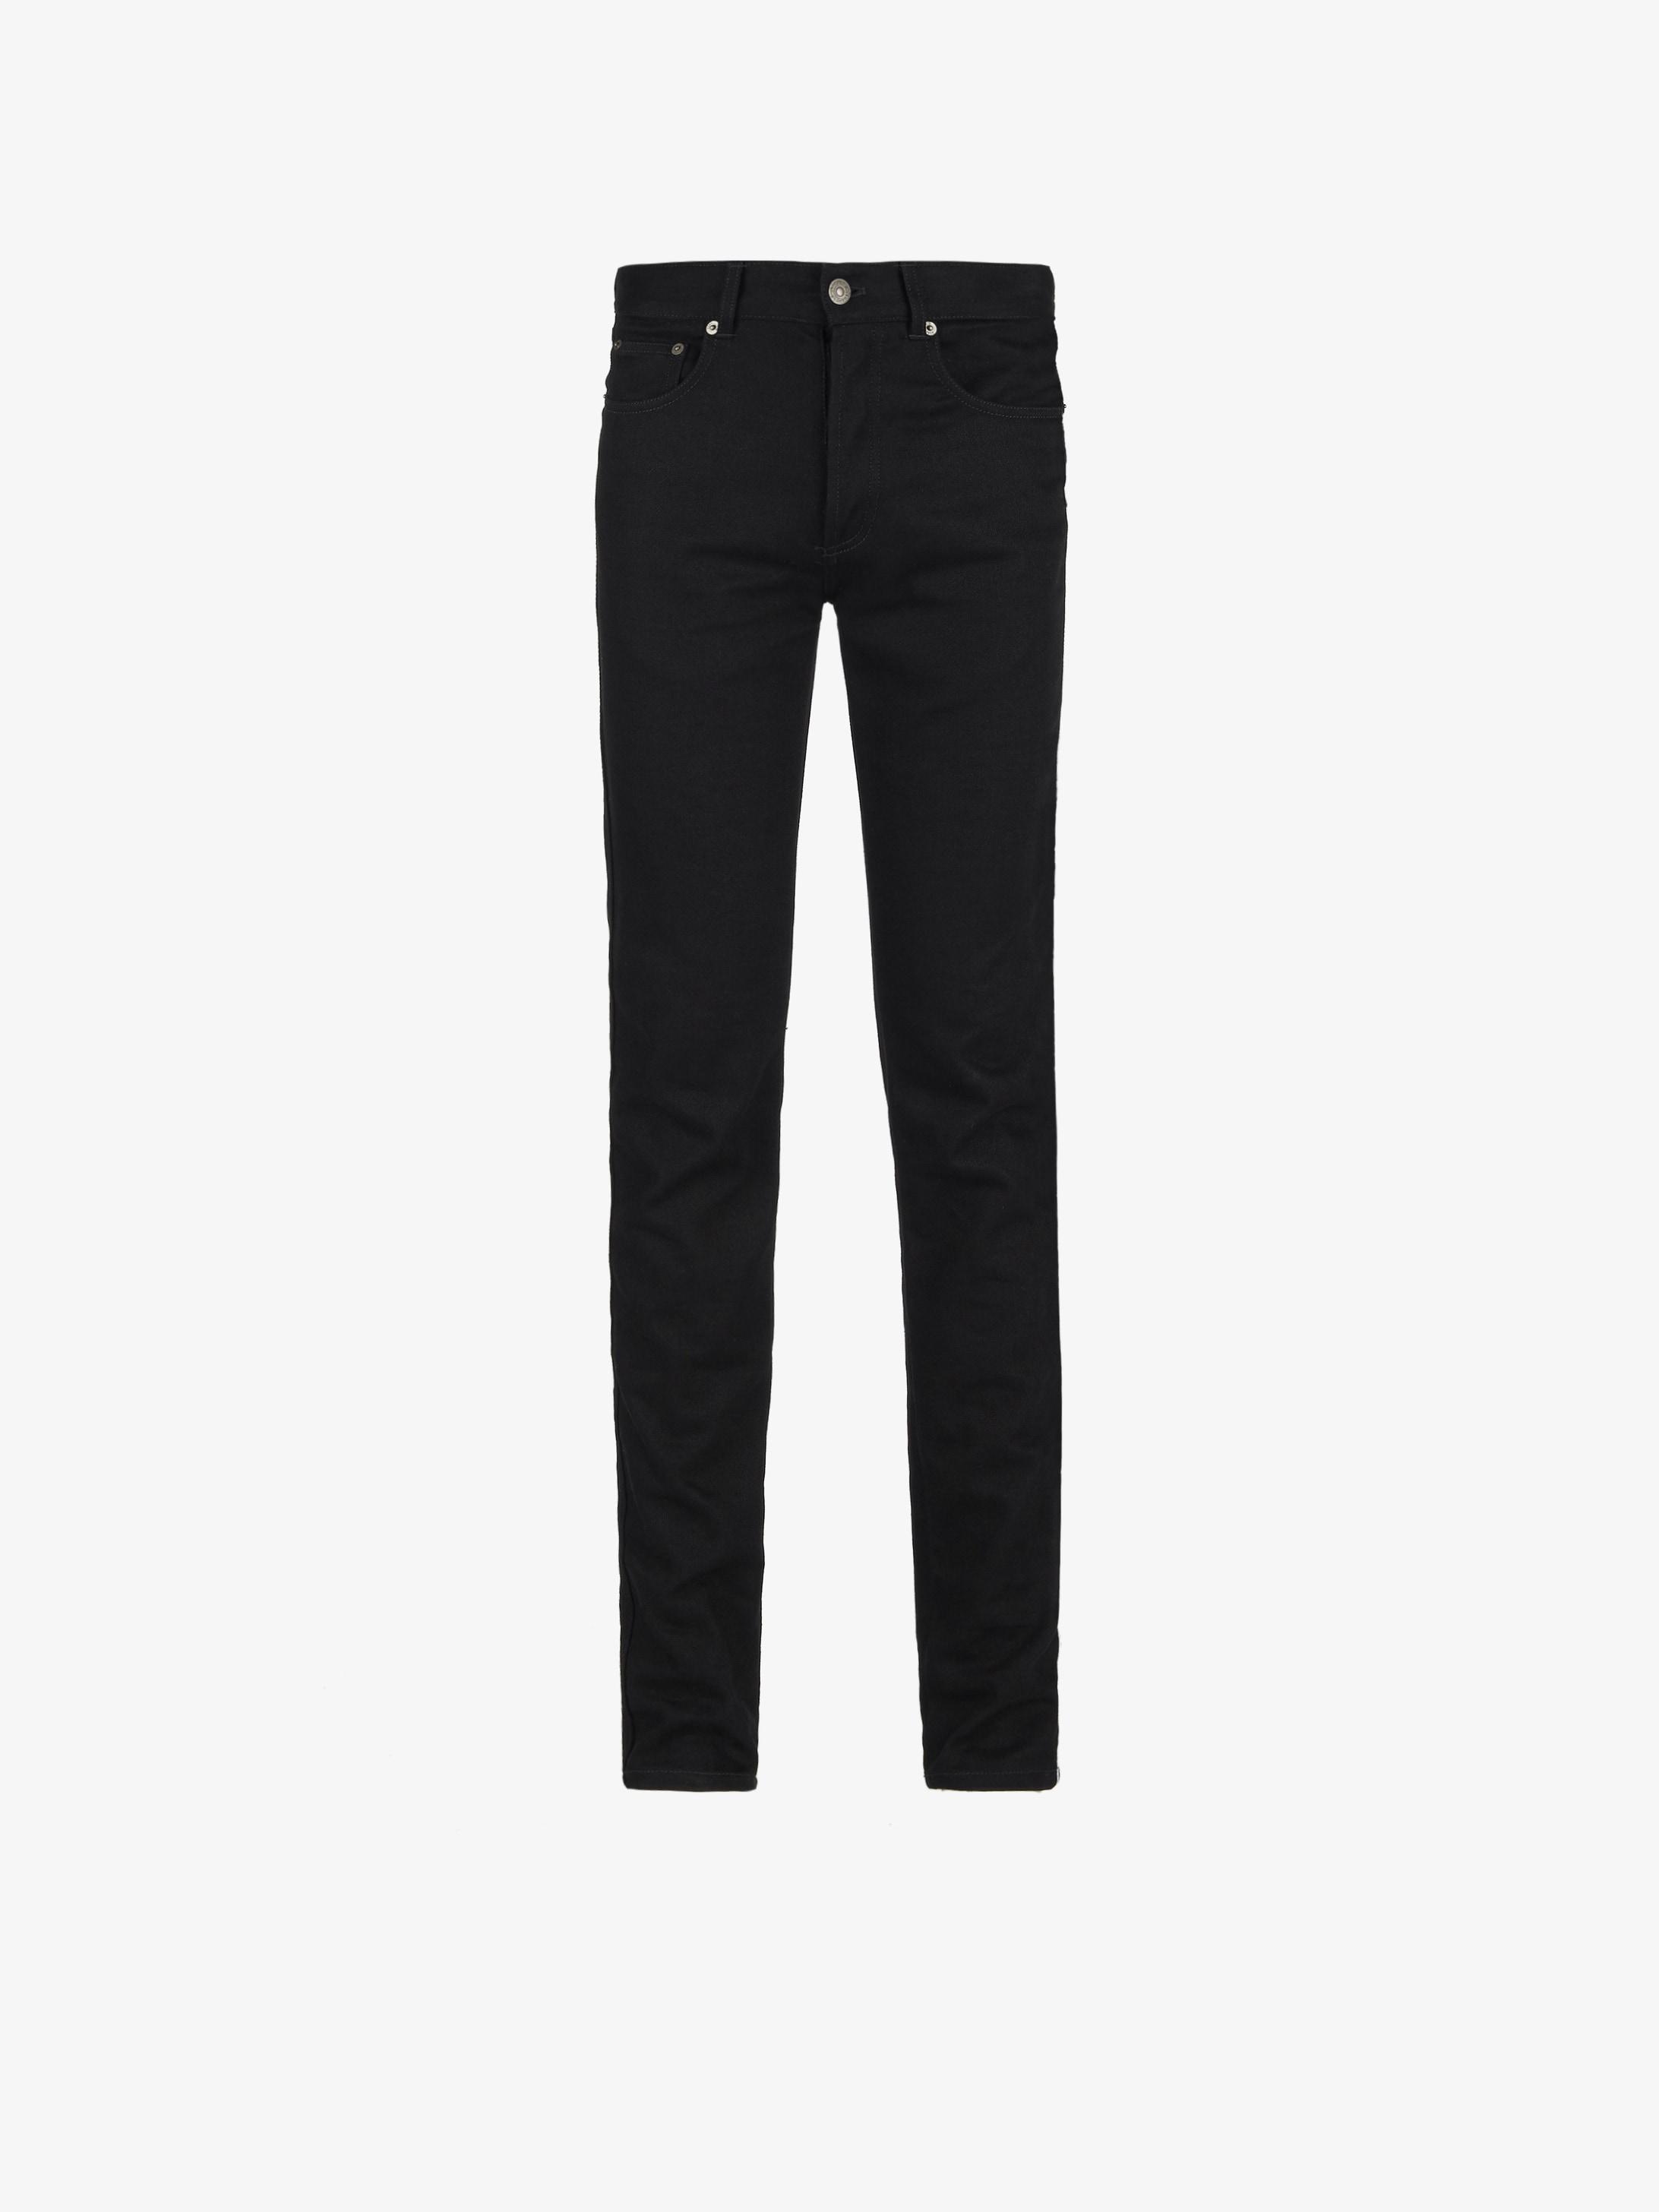 3697d6e2e31b GIVENCHY 4G slim fit denim trousers